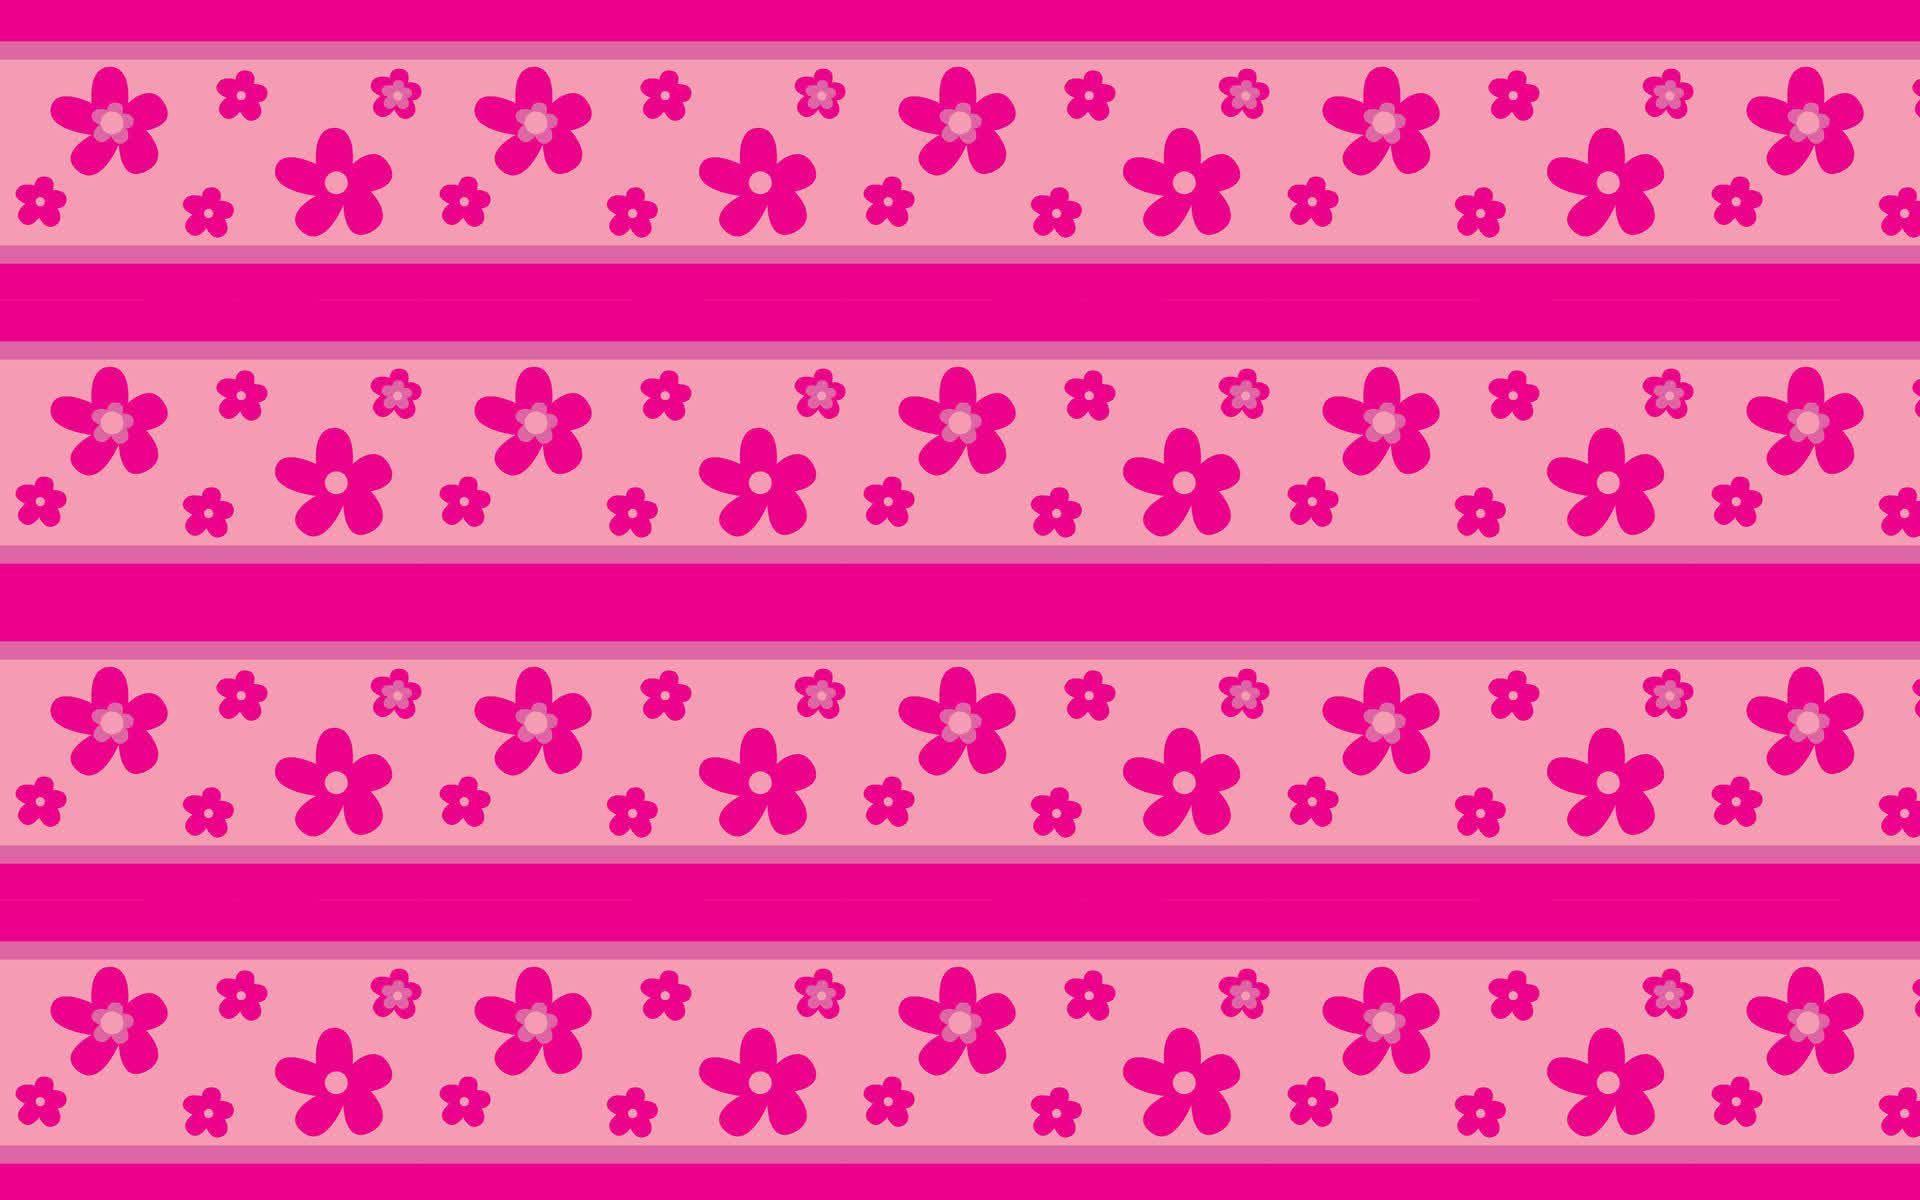 Hot pink backgrounds for desktop hd wallpaper hd wallpapers hot pink backgrounds for desktop hd wallpaper voltagebd Image collections